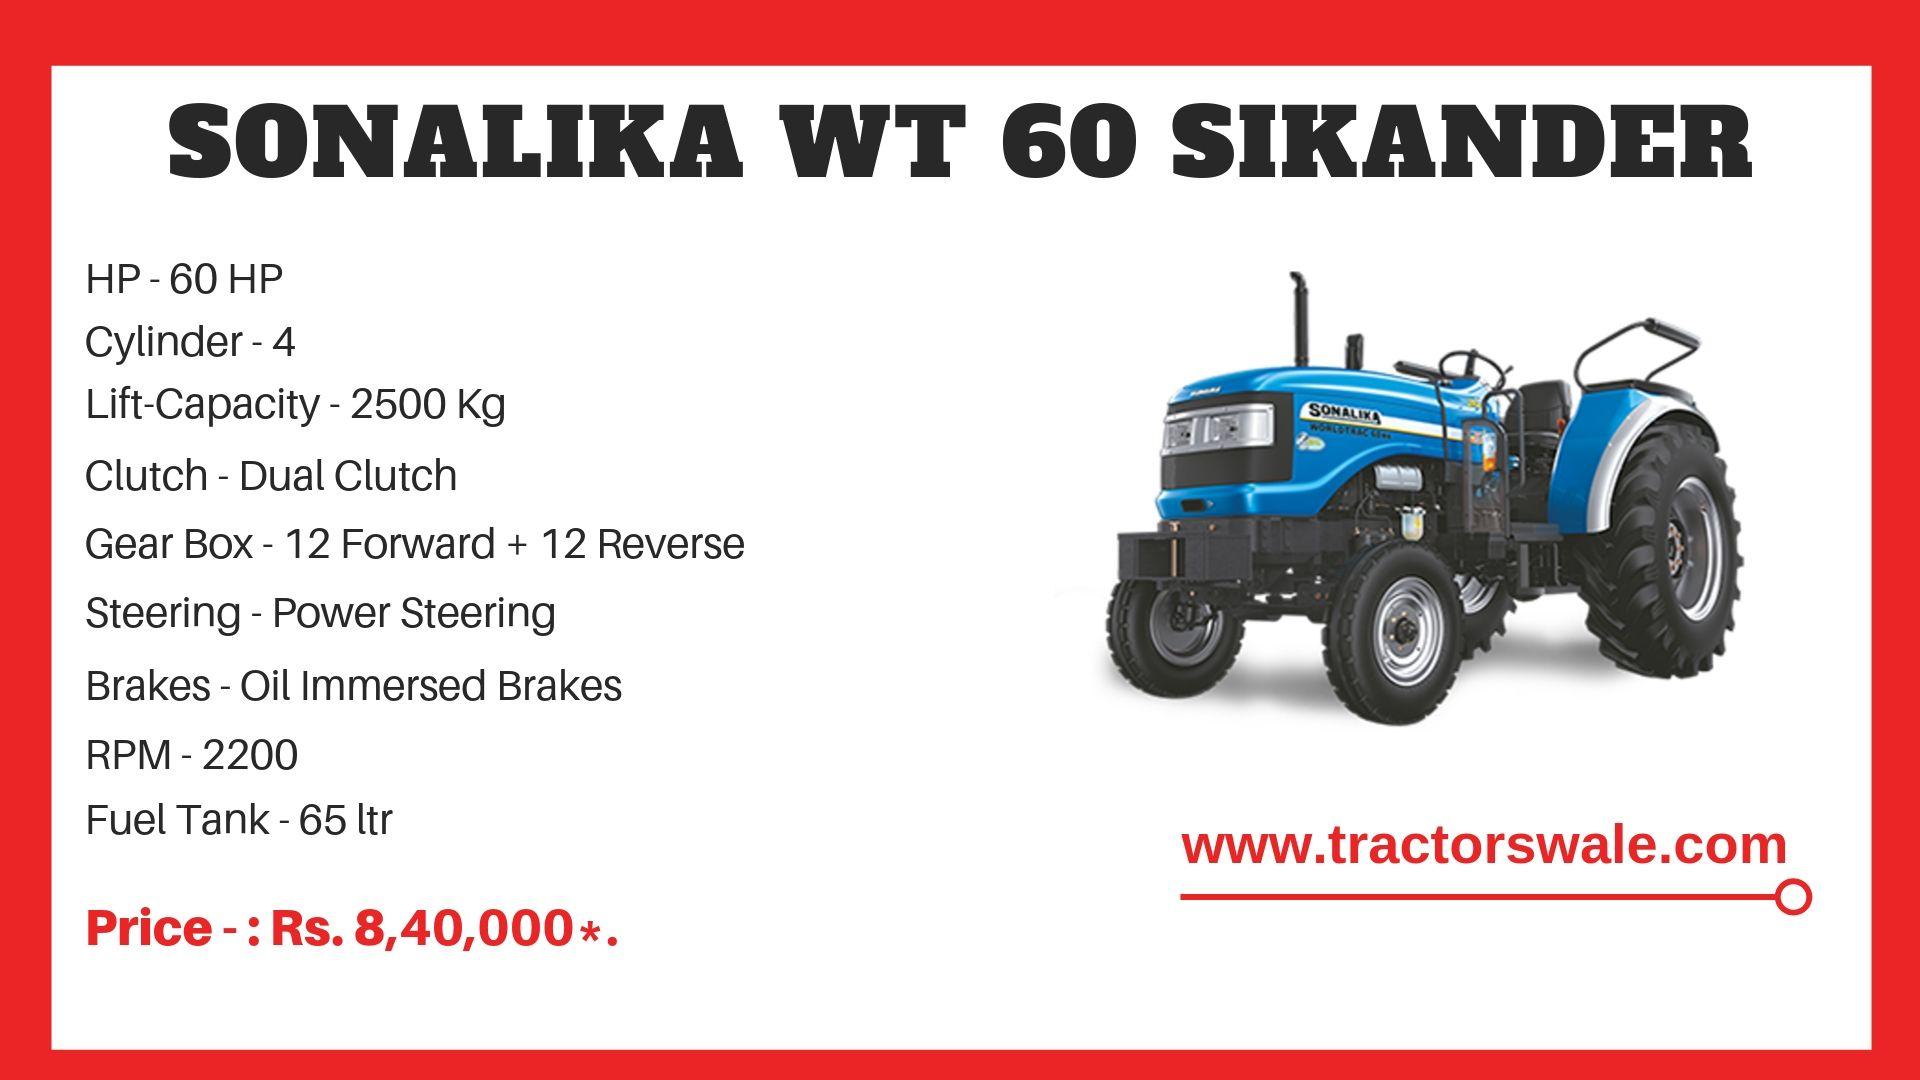 Sonalika WT 60 SIKANDER tractor specs